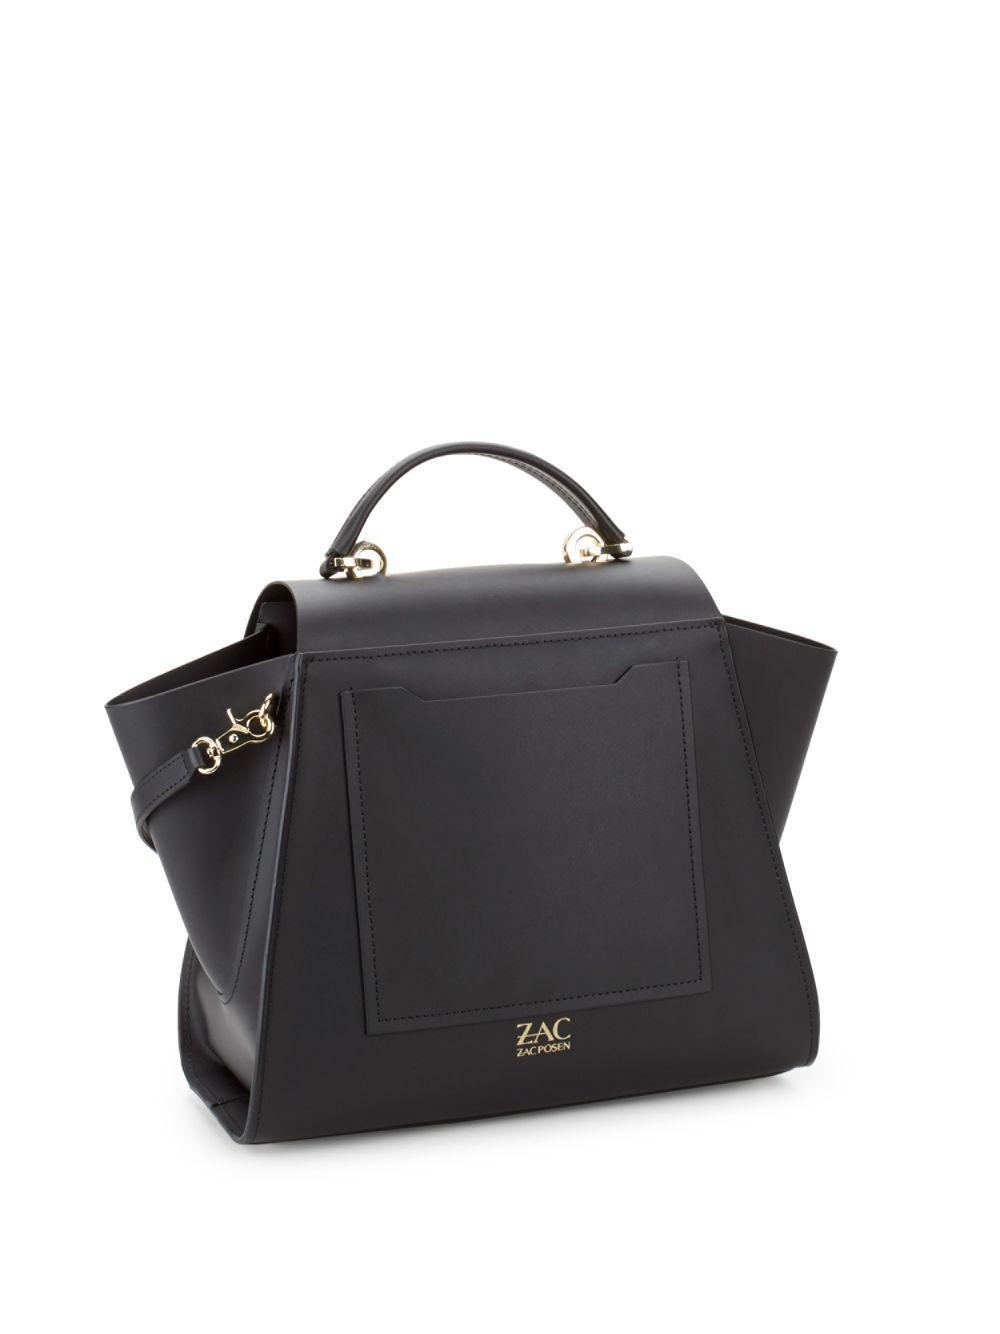 Zac Zac Posen Eartha Flap Leather Top Handle Bag In Black